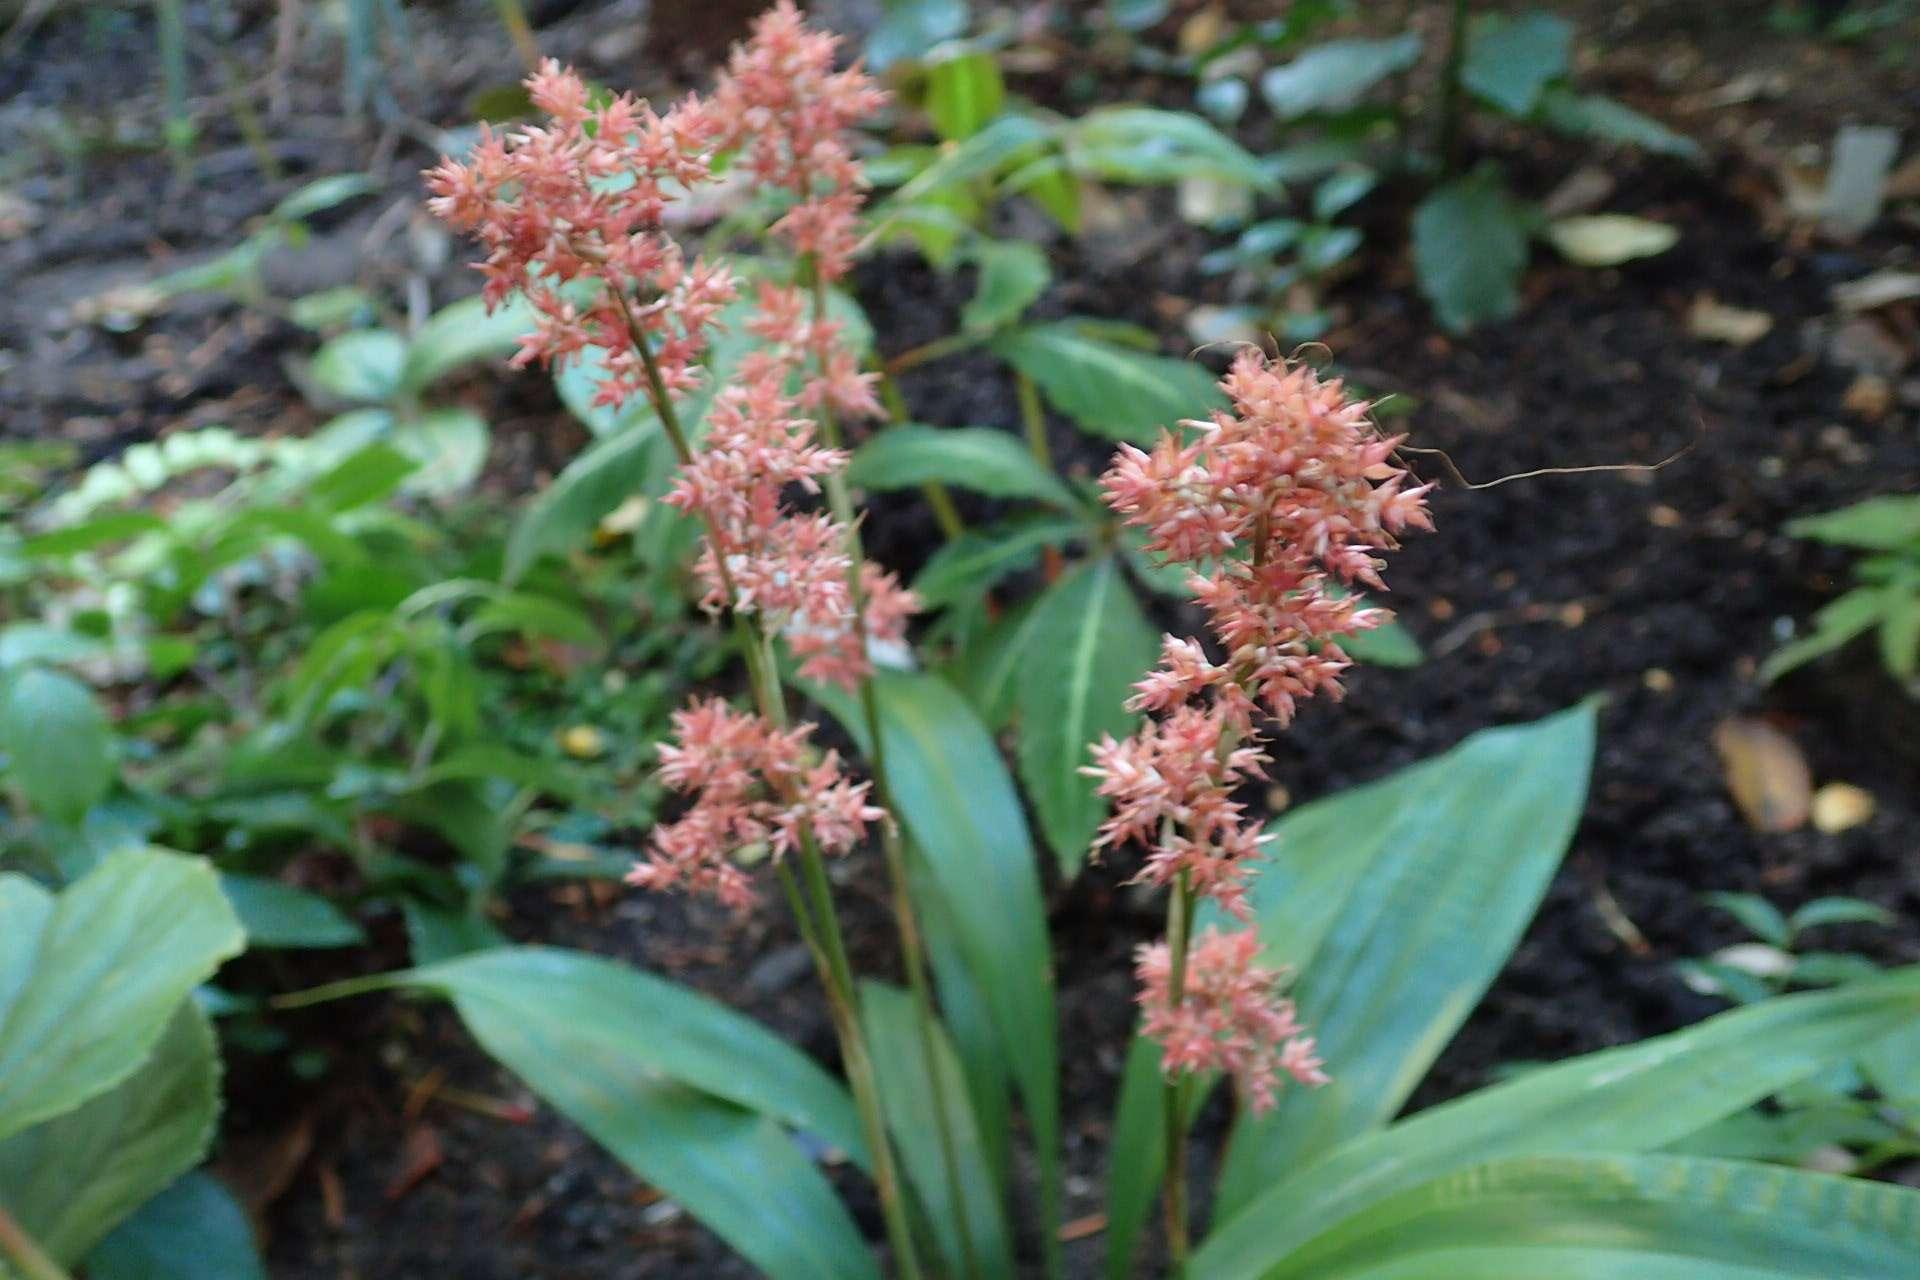 Carex scaposa